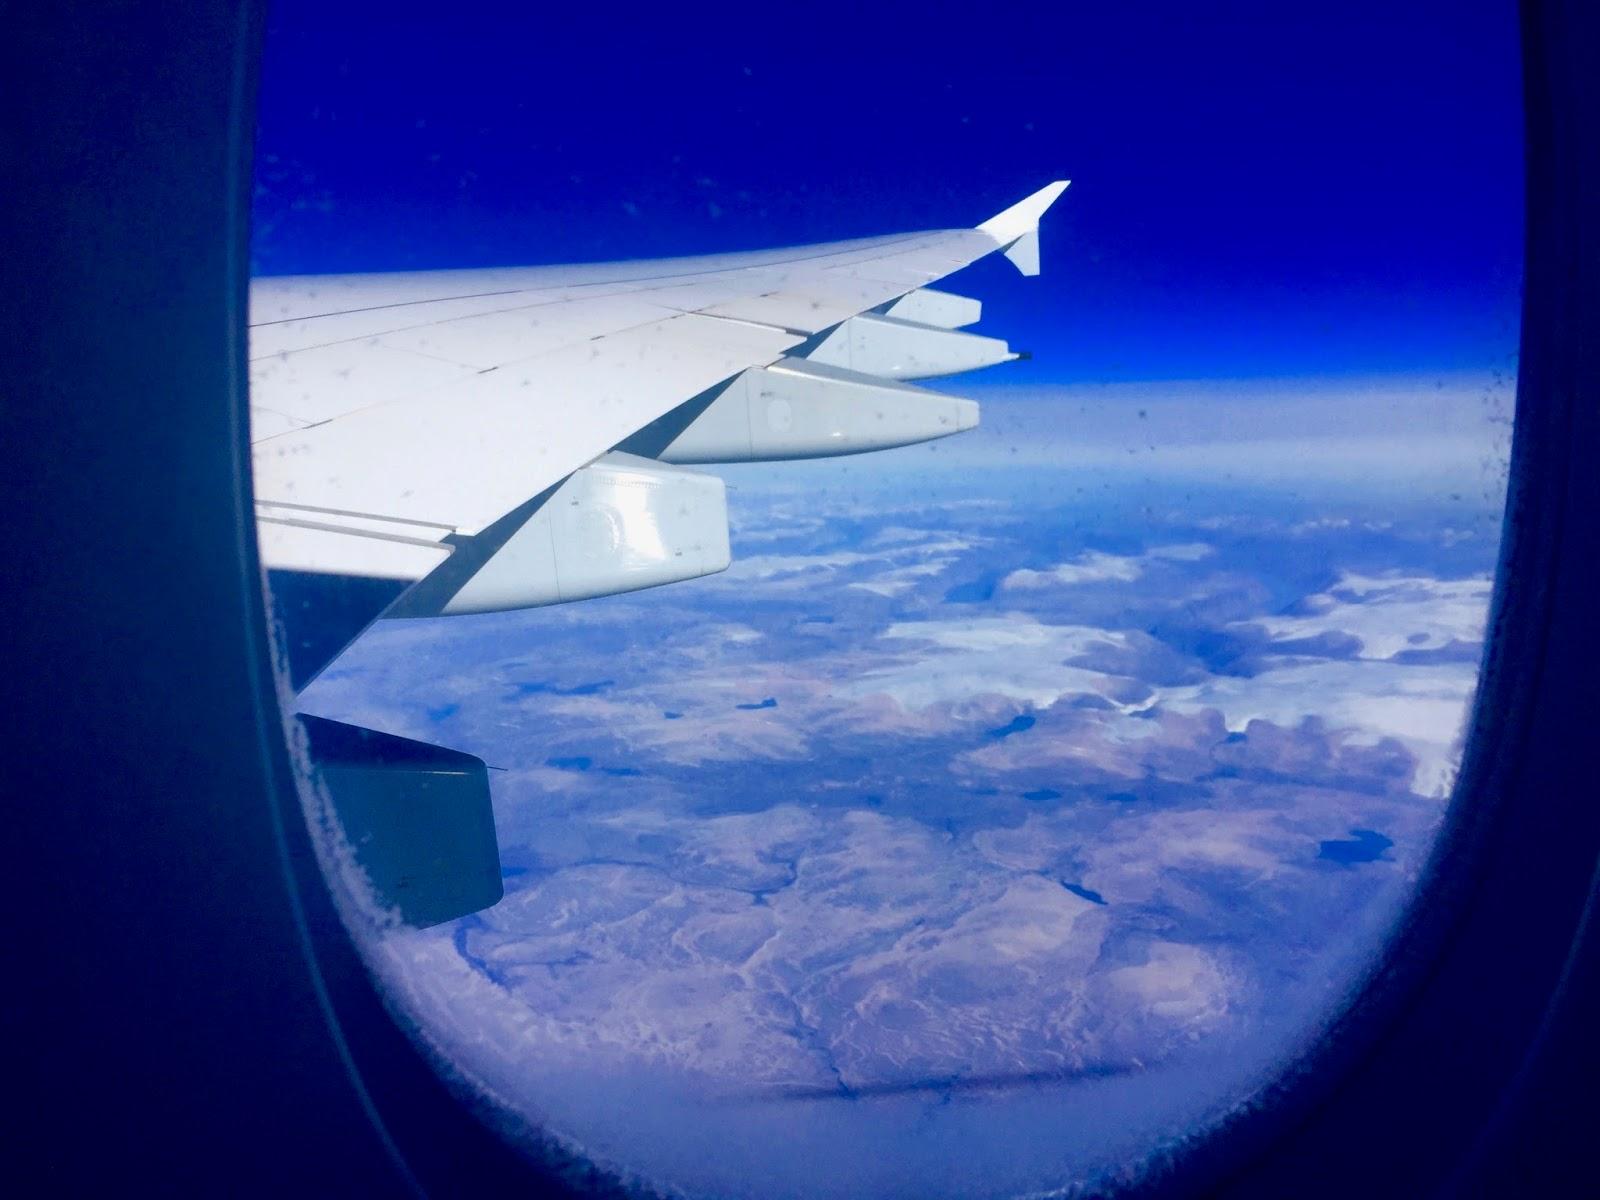 On Lufthansa flight to San Francisco